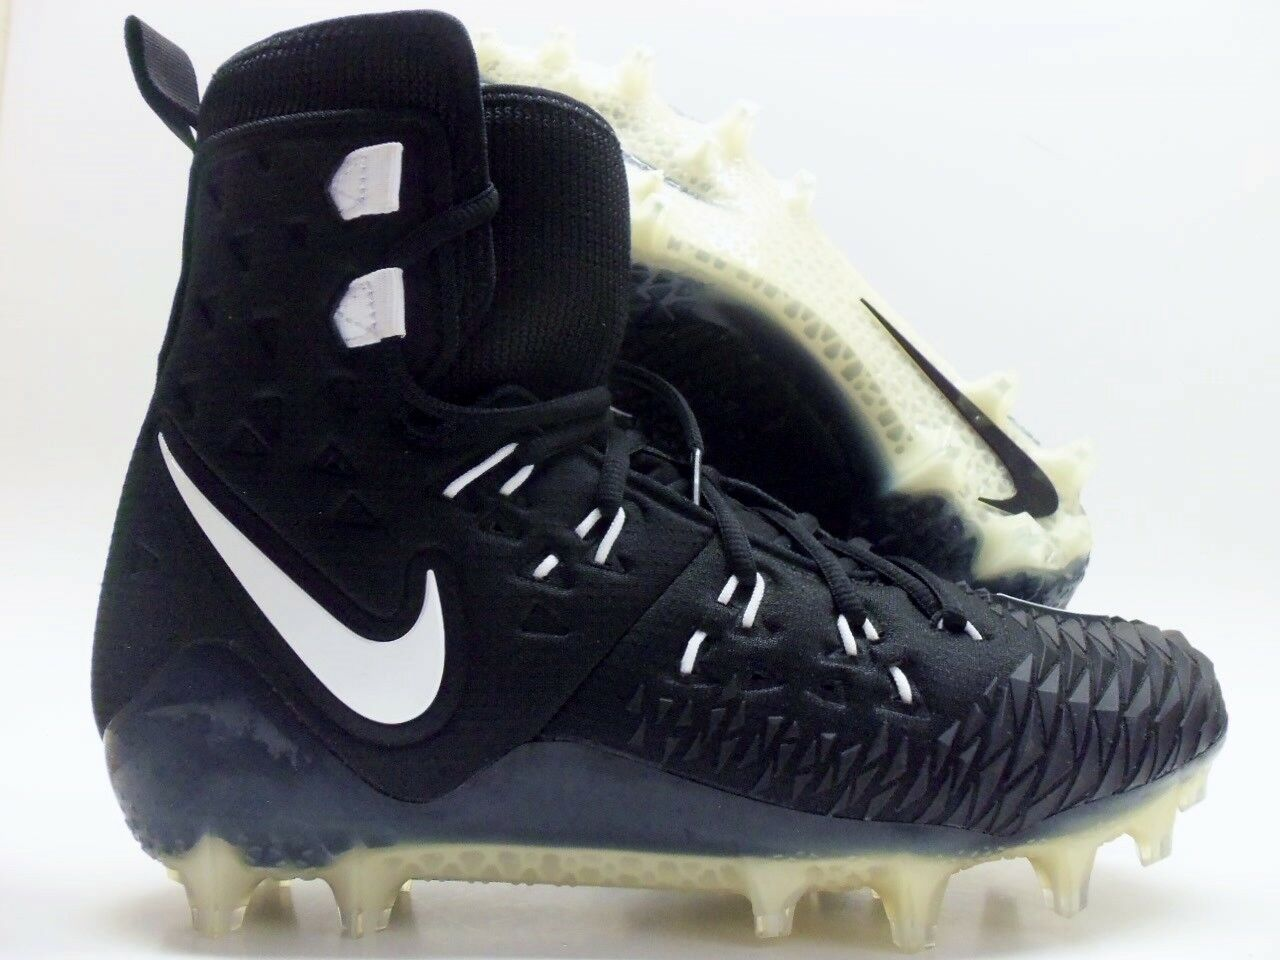 NIKE FORCE SAVAGE ELITE TD FOOTBALL CLEAT BLACK WHITE SZ MEN'S 11 [857063-011]